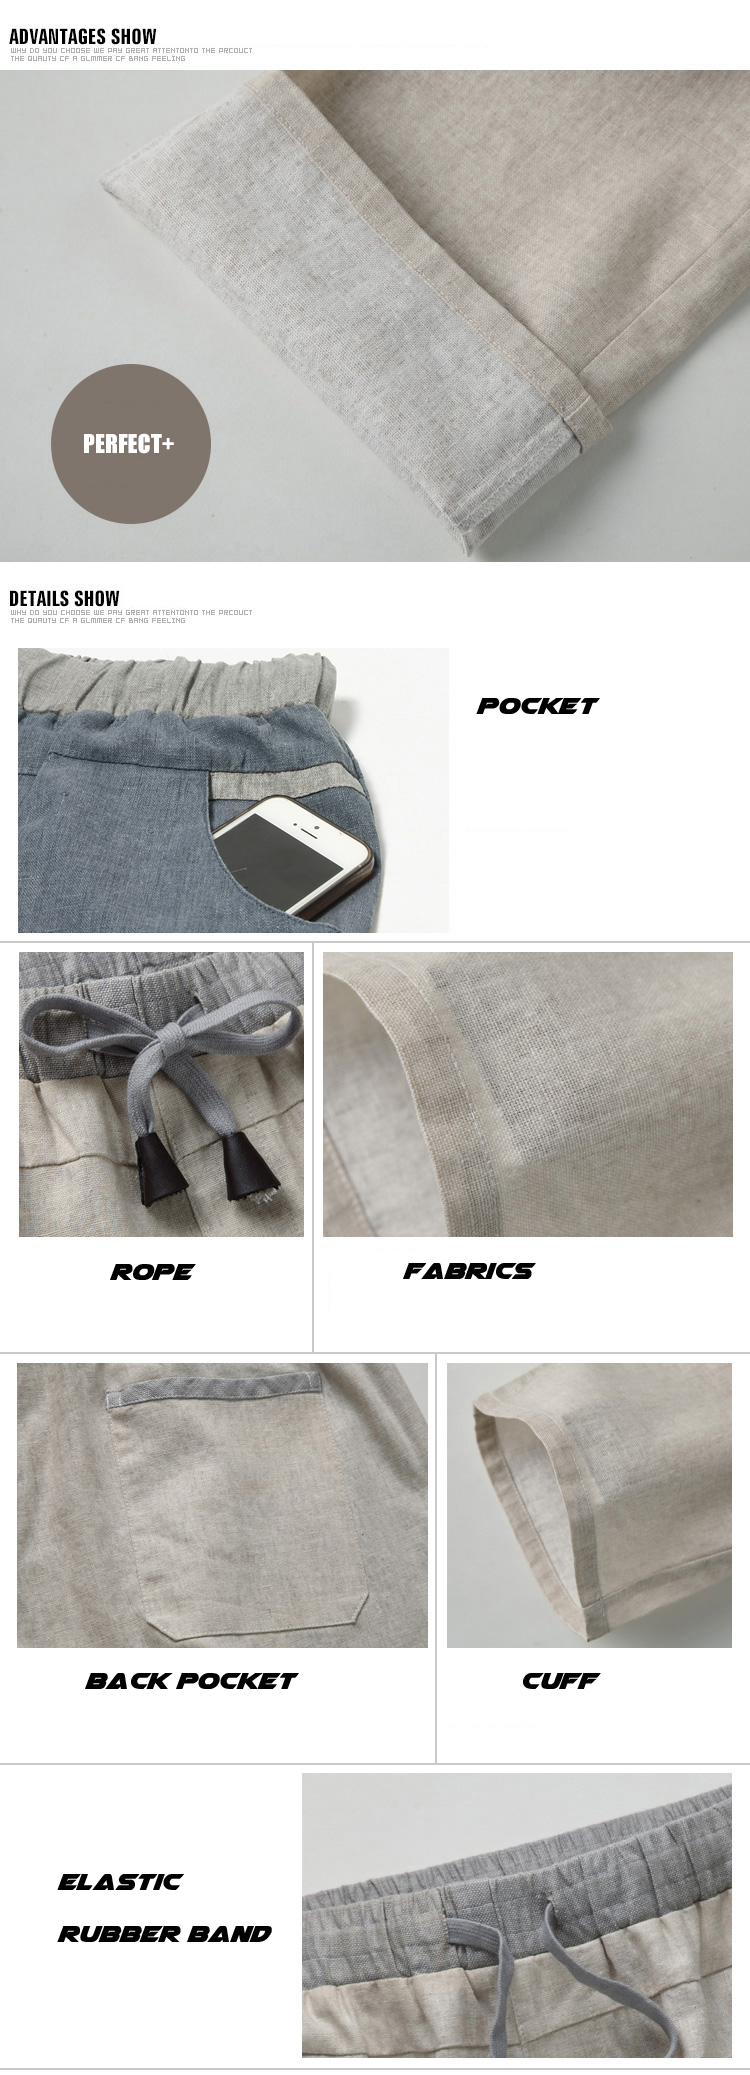 HTB1Dhw7ny0TMKJjSZFNq6y 1FXaJ Men Pants Linen Drawstring Flax Pants Straight Full Length solid Linen Cotton Home Men's Trousers Fashion Pants Linen Size M-3XL